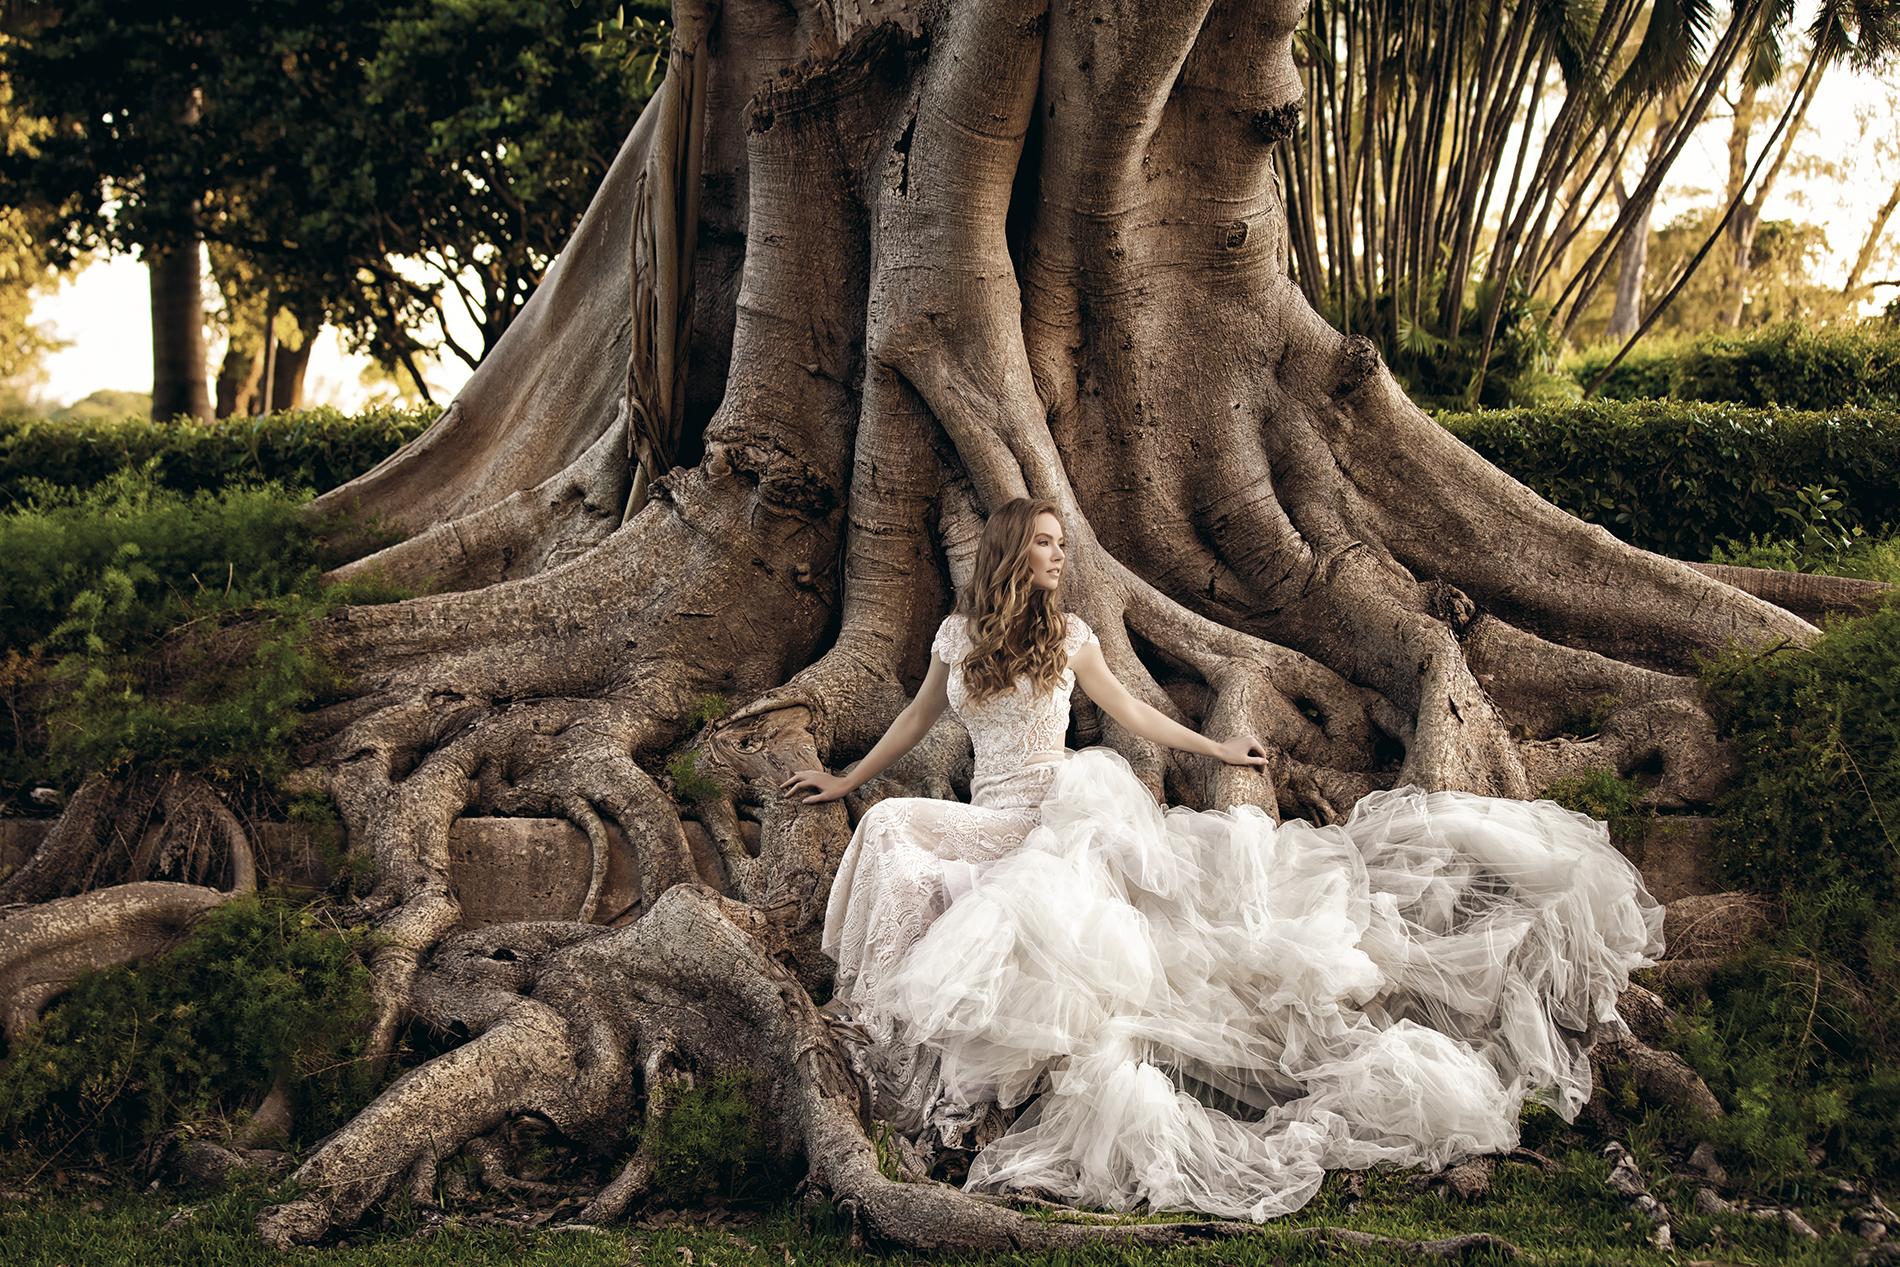 Bankston Wedding Album - An in depth look at the Bankston Wedding Album Design